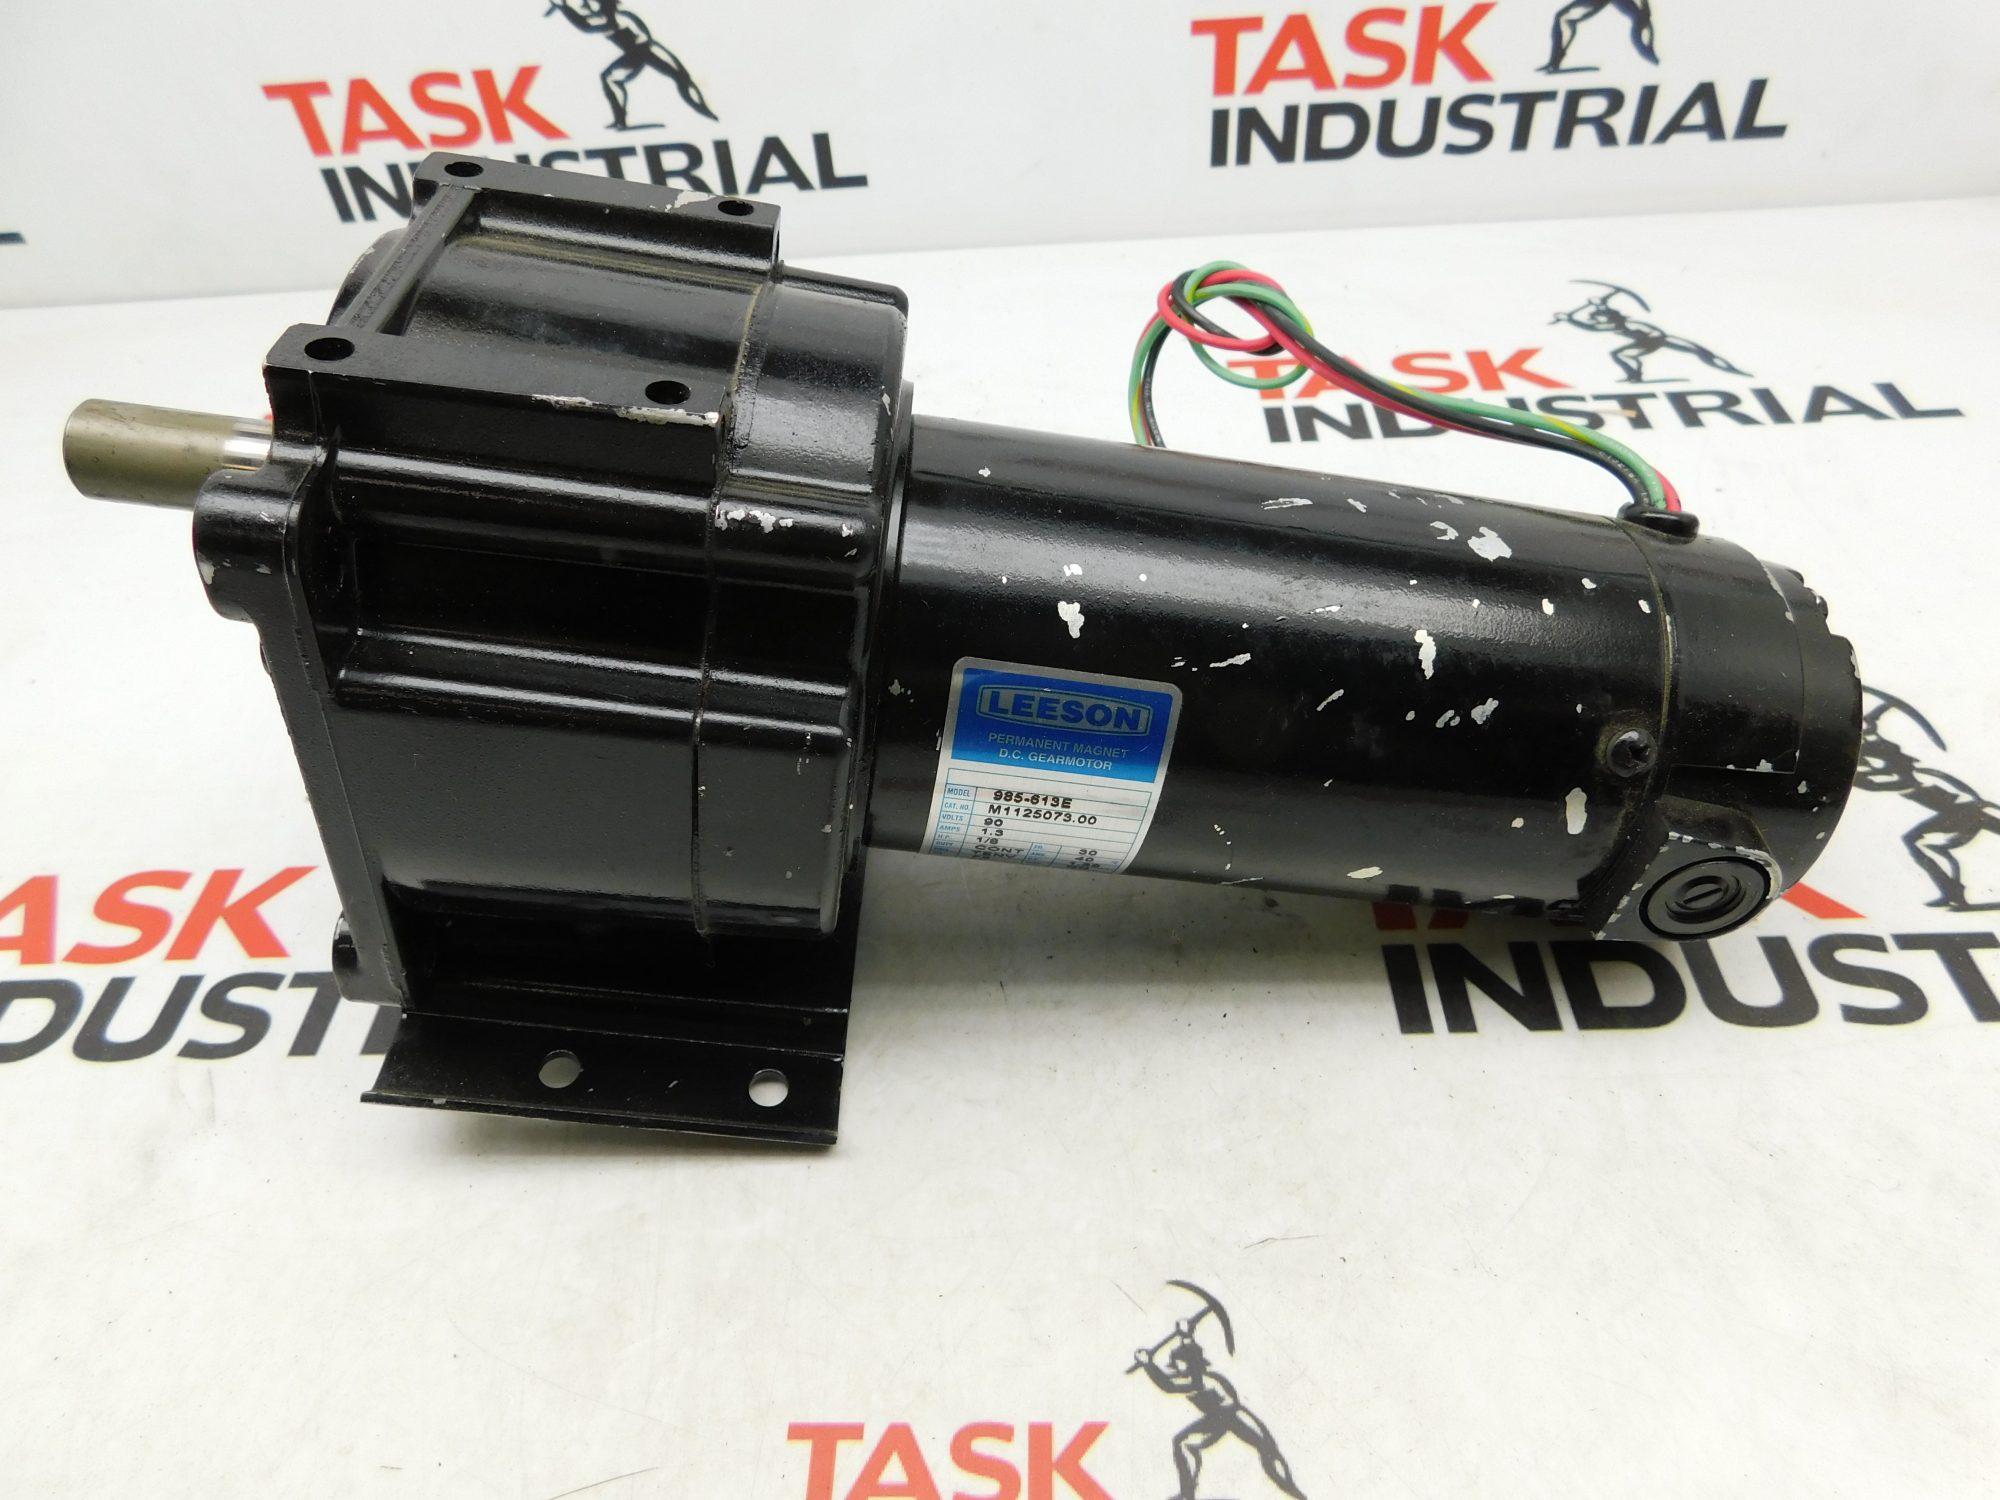 Leeson CAT No. M1125073.00 DC Gear Motor 90V, 1/8HP, TENV